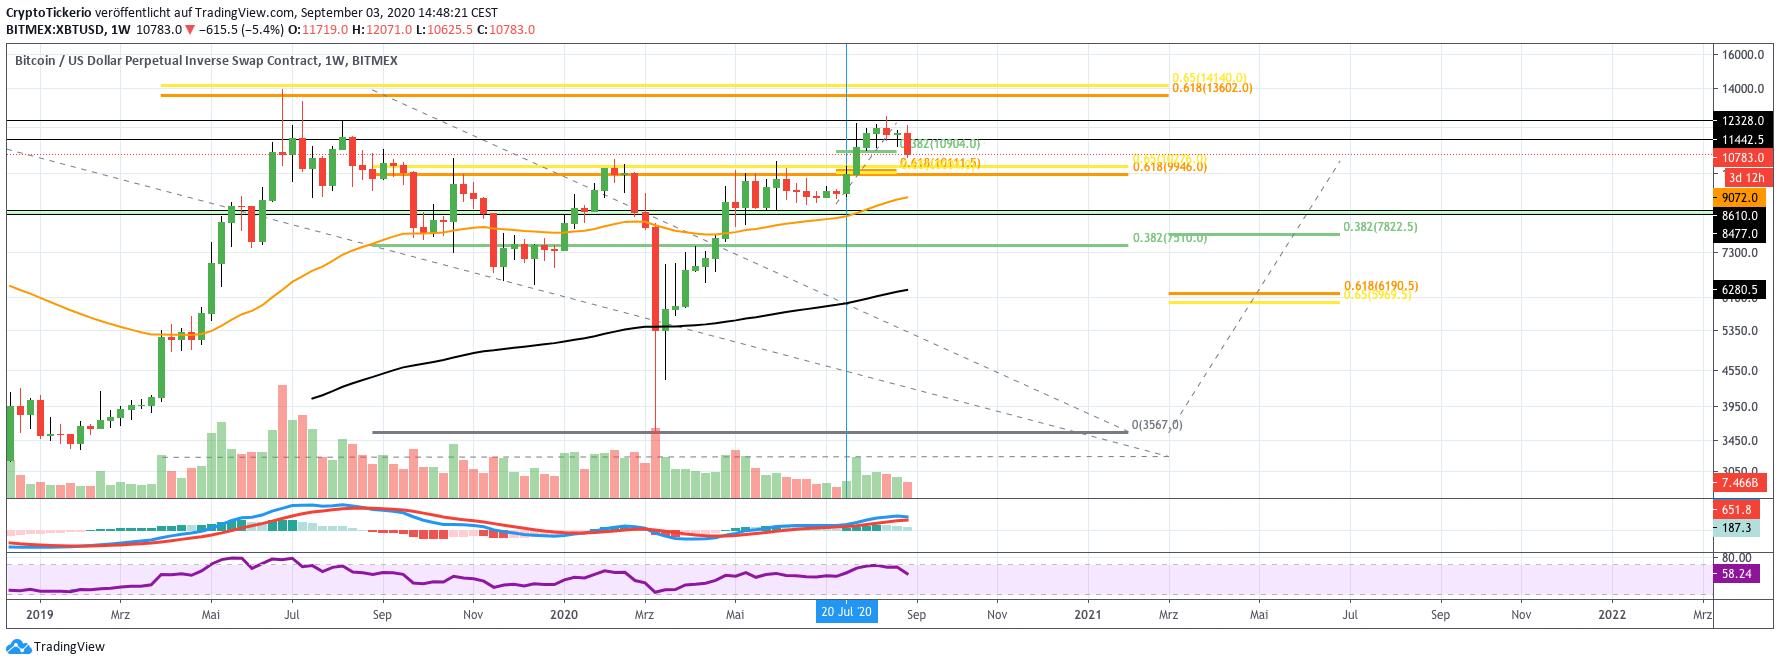 BTC/USD weekly price chart